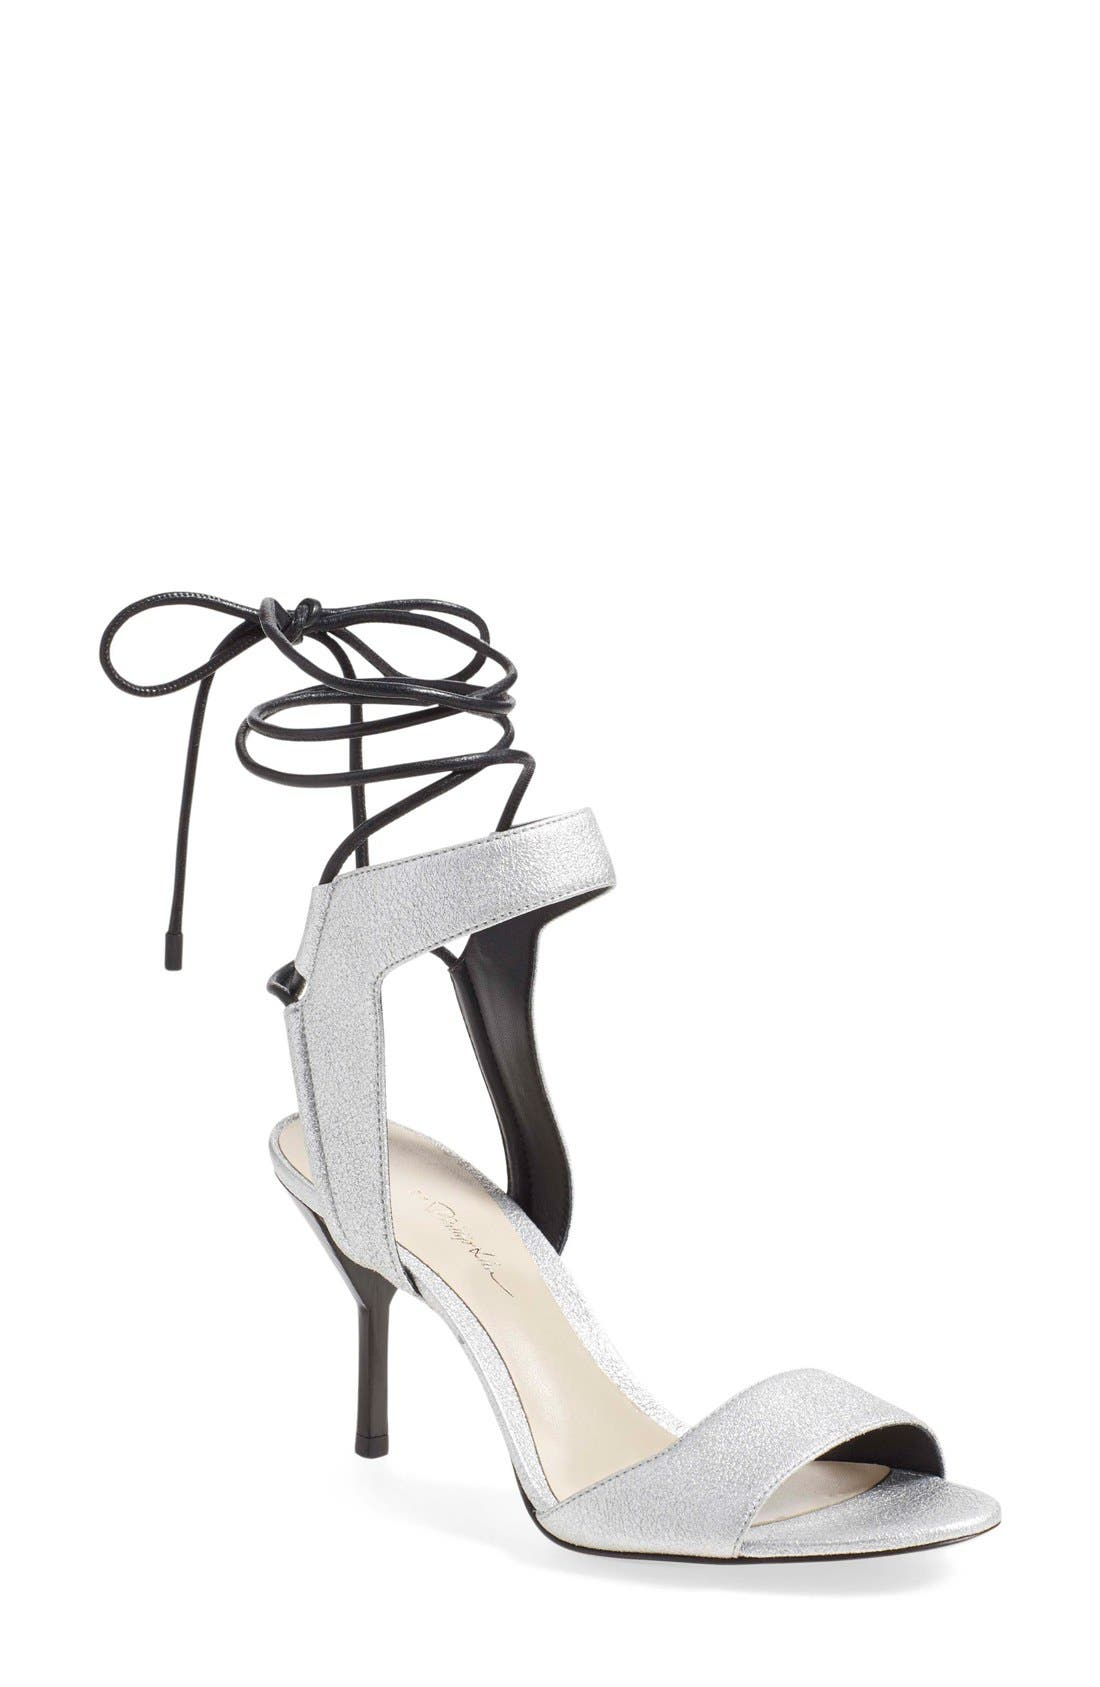 Alternate Image 1 Selected - 3.1 Phillip Lim 'Martini' Wraparound Ankle Strap Sandal (Women)